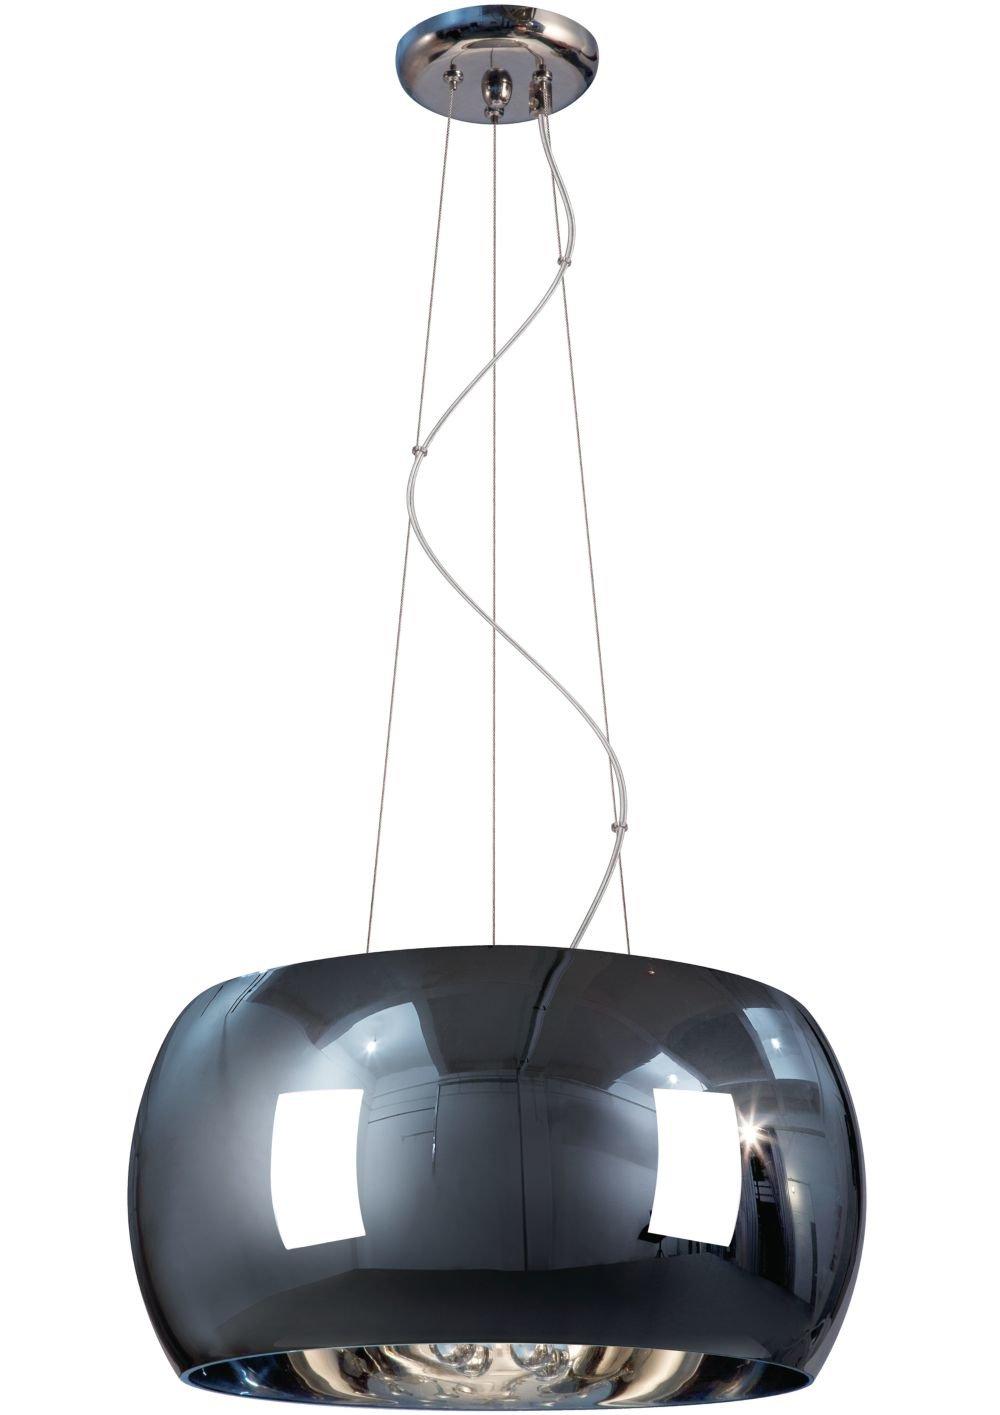 Buy Philips 30899 42-Watt Pendant Light (Chrome) Online at Low Prices in India - Amazon.in  sc 1 st  Amazon.in & Buy Philips 30899 42-Watt Pendant Light (Chrome) Online at Low ...